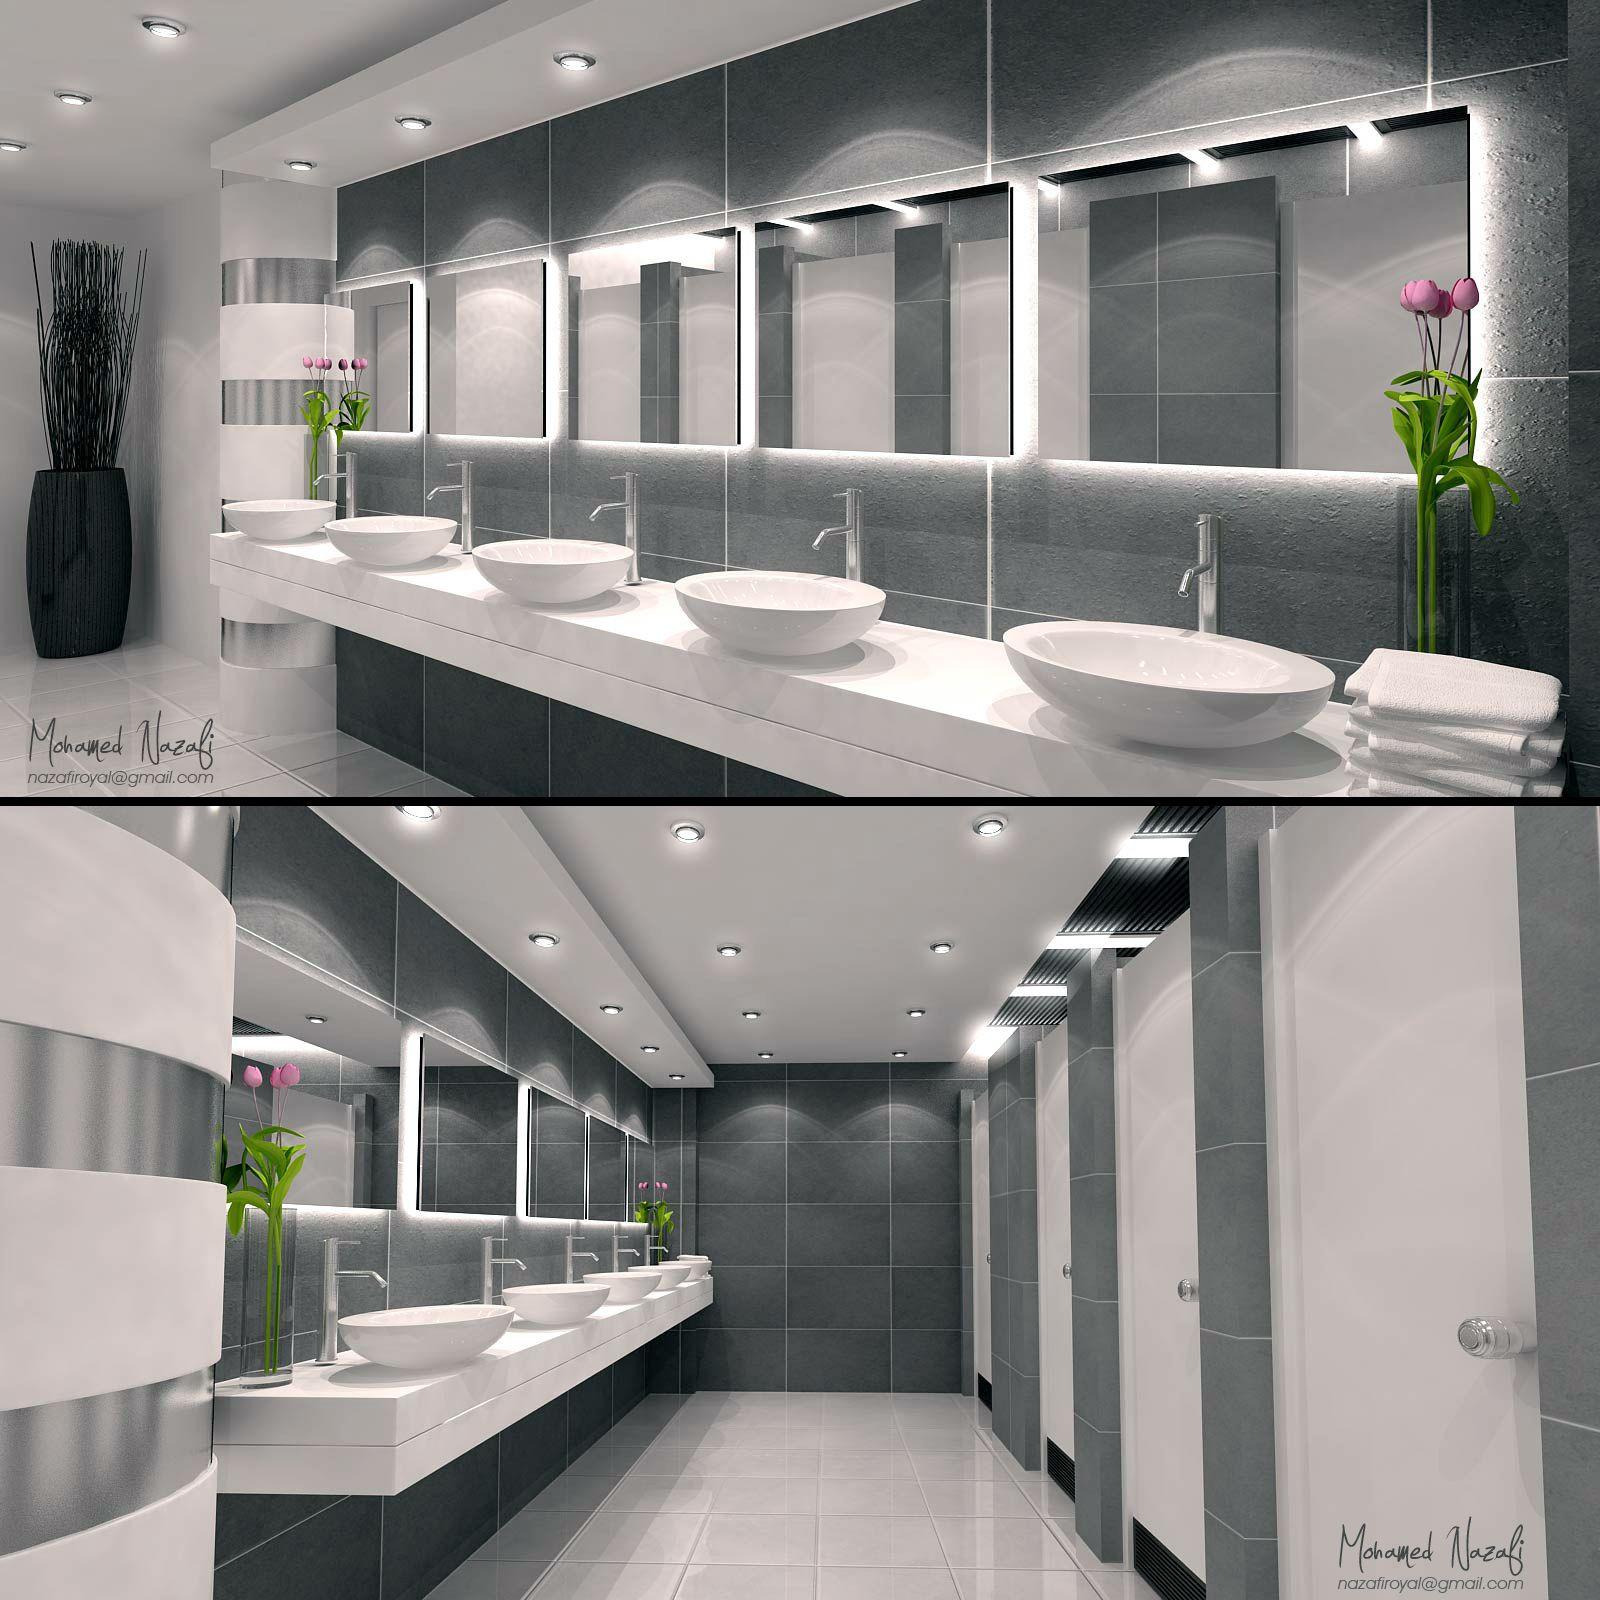 Evermotion - portfolio by Nazafi Mohamed | Washroom design ...